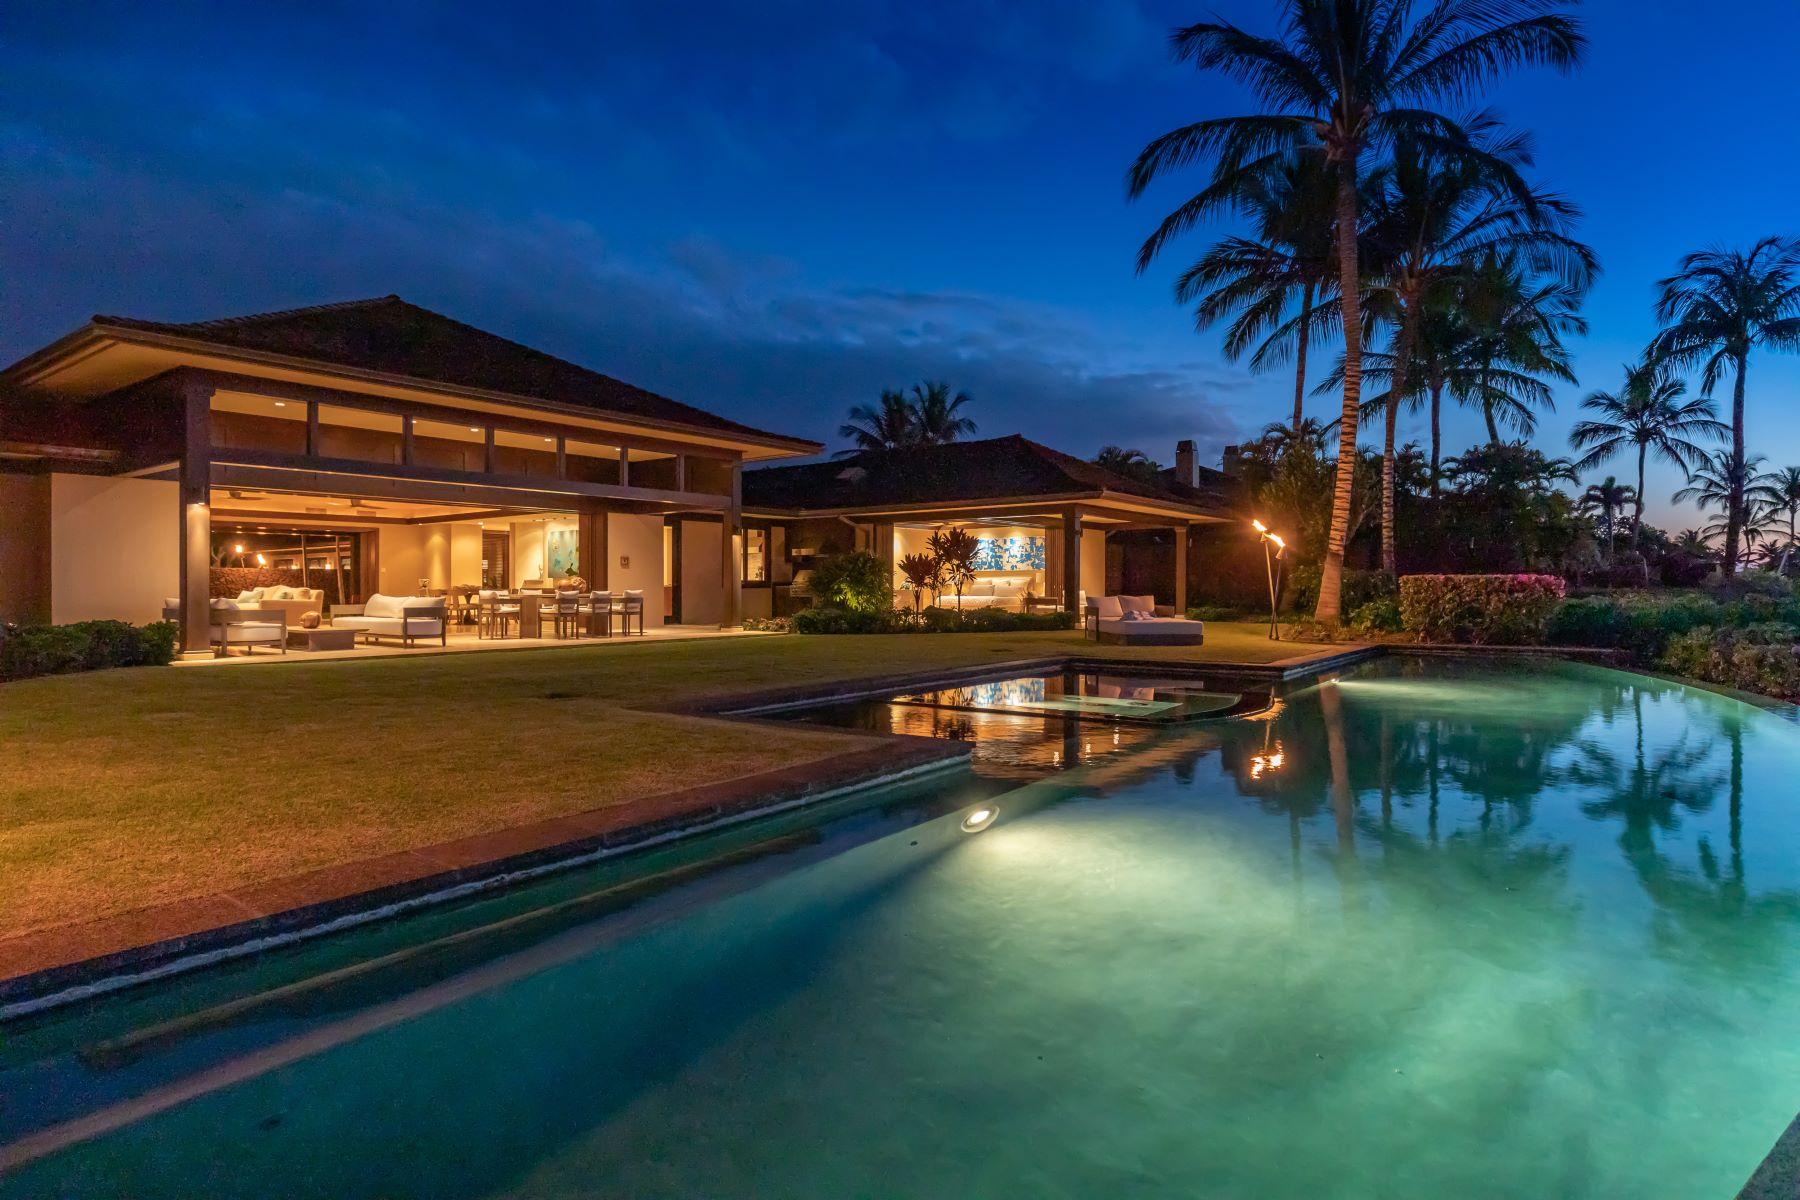 Single Family Homes para Venda às Hualalai Resort: The perfect location over looking 10th hole of Ke'olu Course 72-395 Kaupulehu Drive, Kailua-Kona, Havaí 96740 Estados Unidos